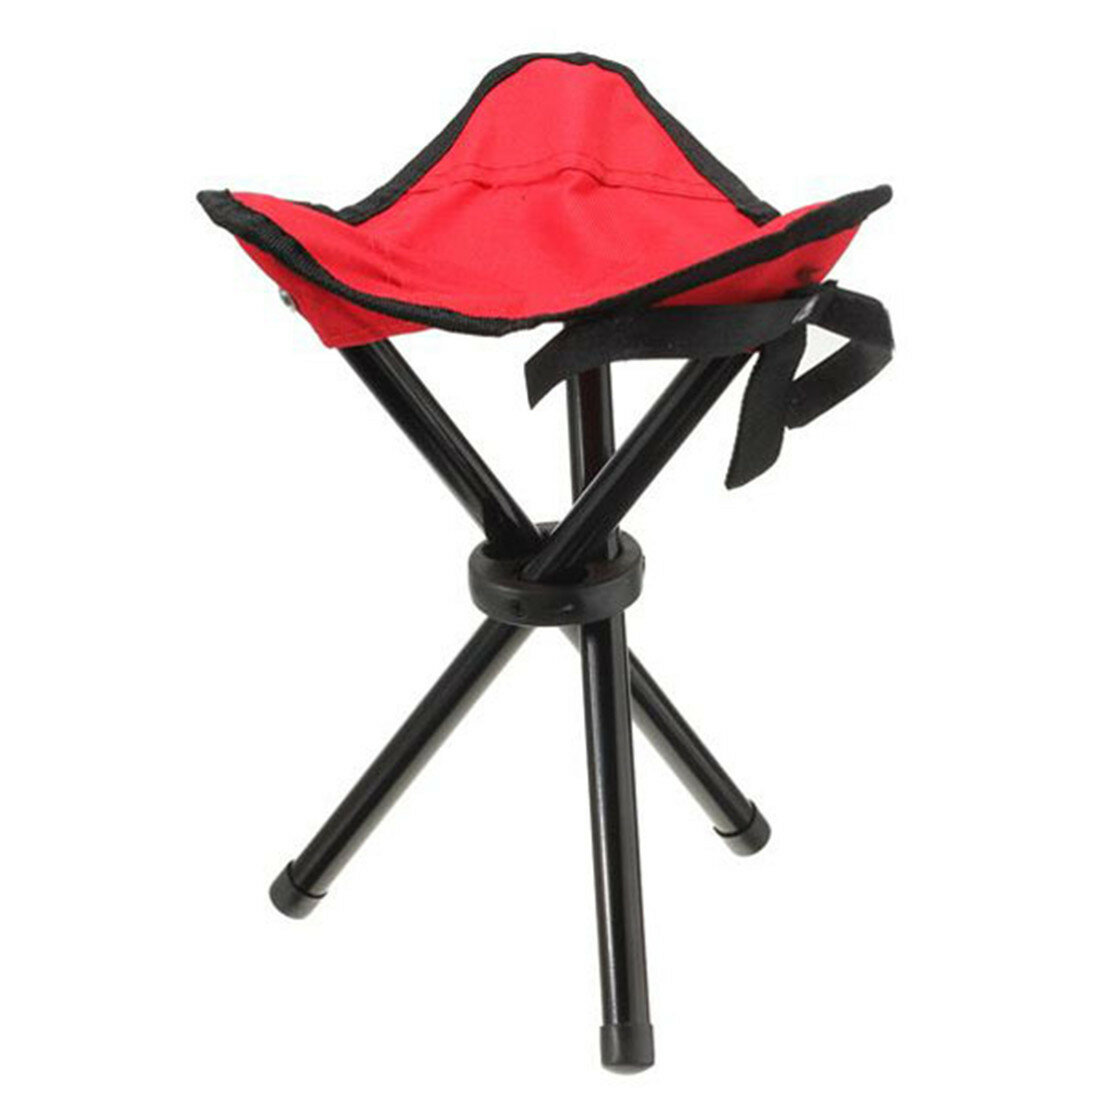 Camping Hiking Fishing Picnic BBQ Folding Foldable Stool Tripod Chair